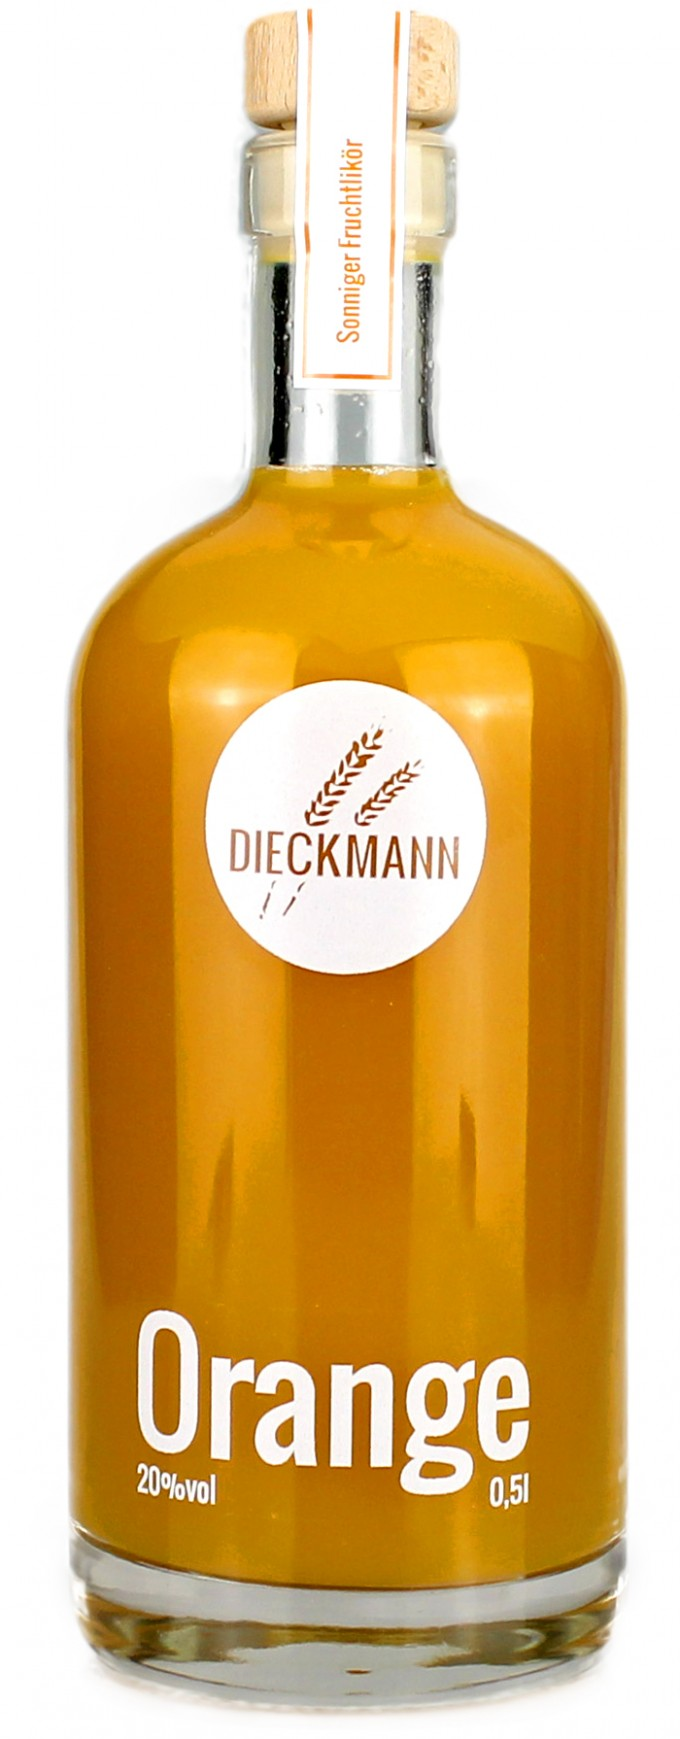 Weizenbrennerei & Likörmanufaktur Dieckmann Orange - Fruchtlikör LIKÖR 20%vol., 0,5l